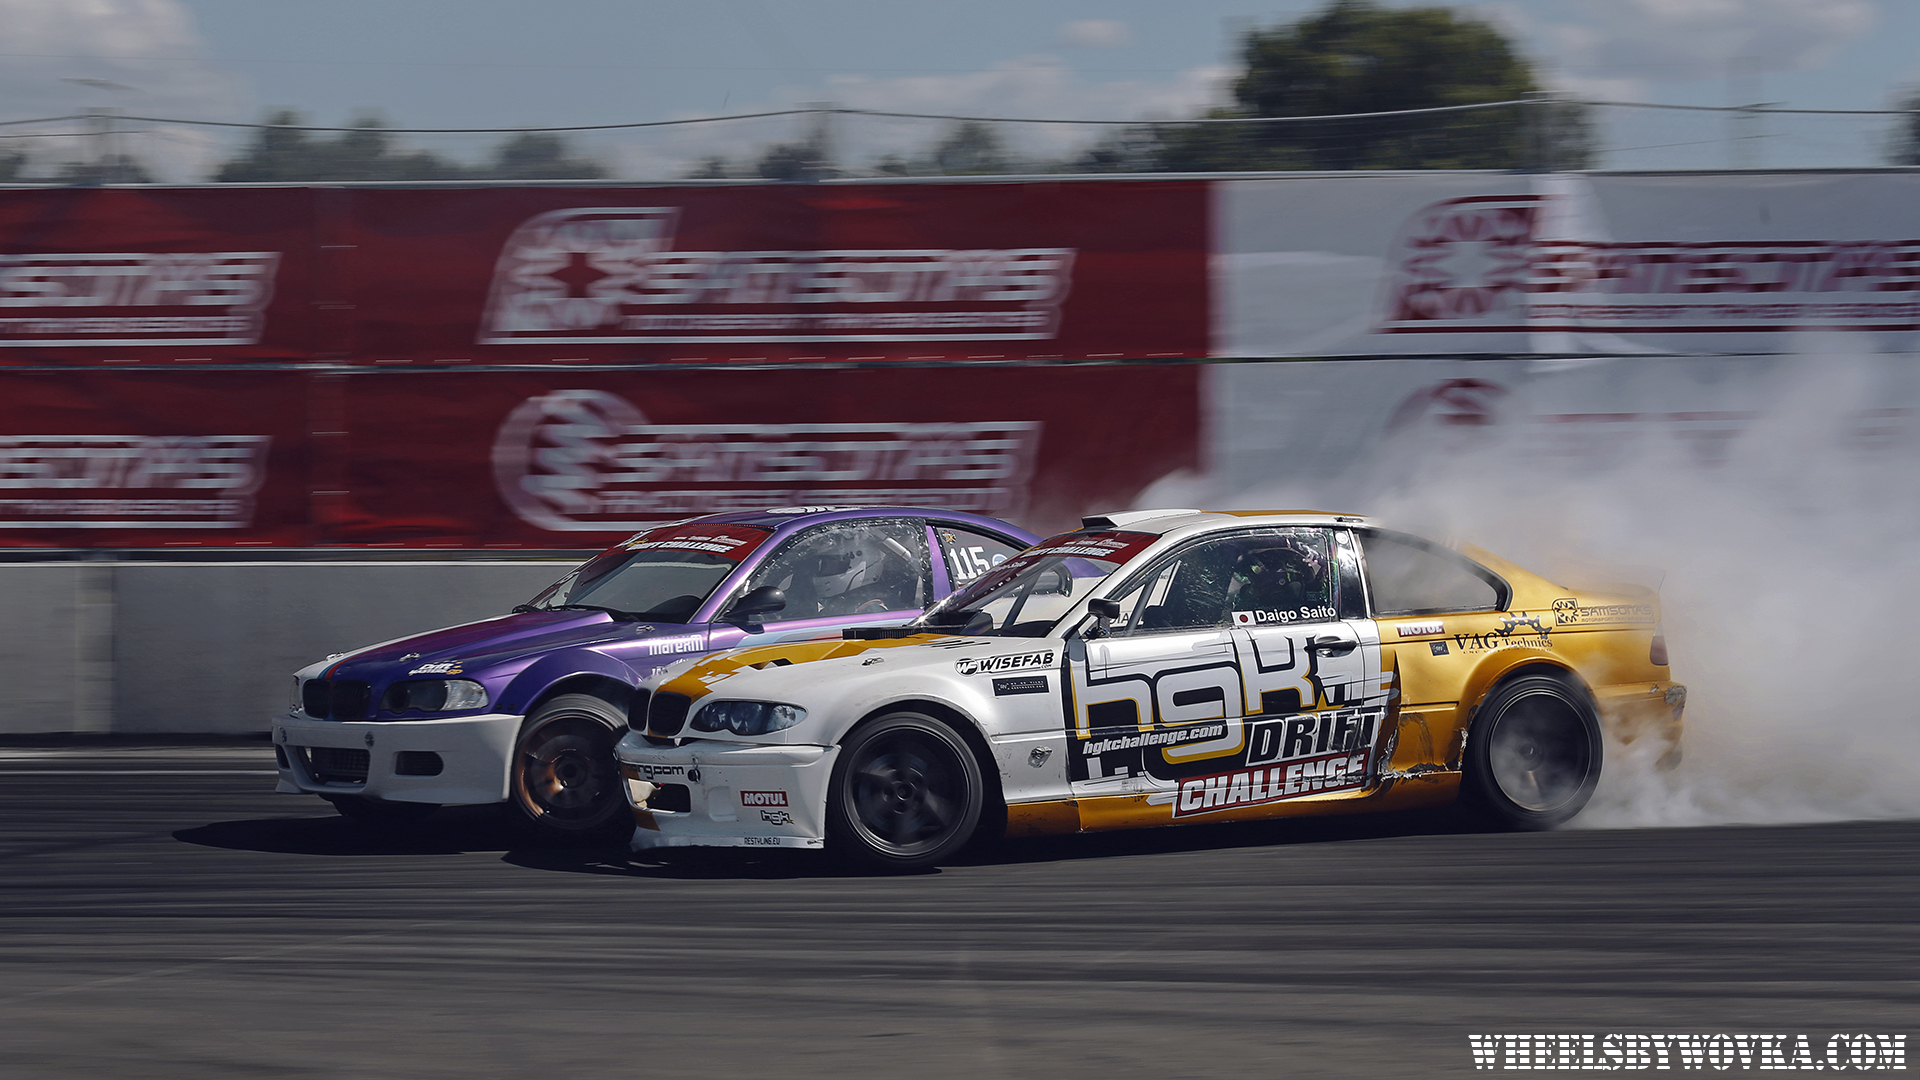 hgk-drift-challenge-2017-by-wheelsbywovka-20